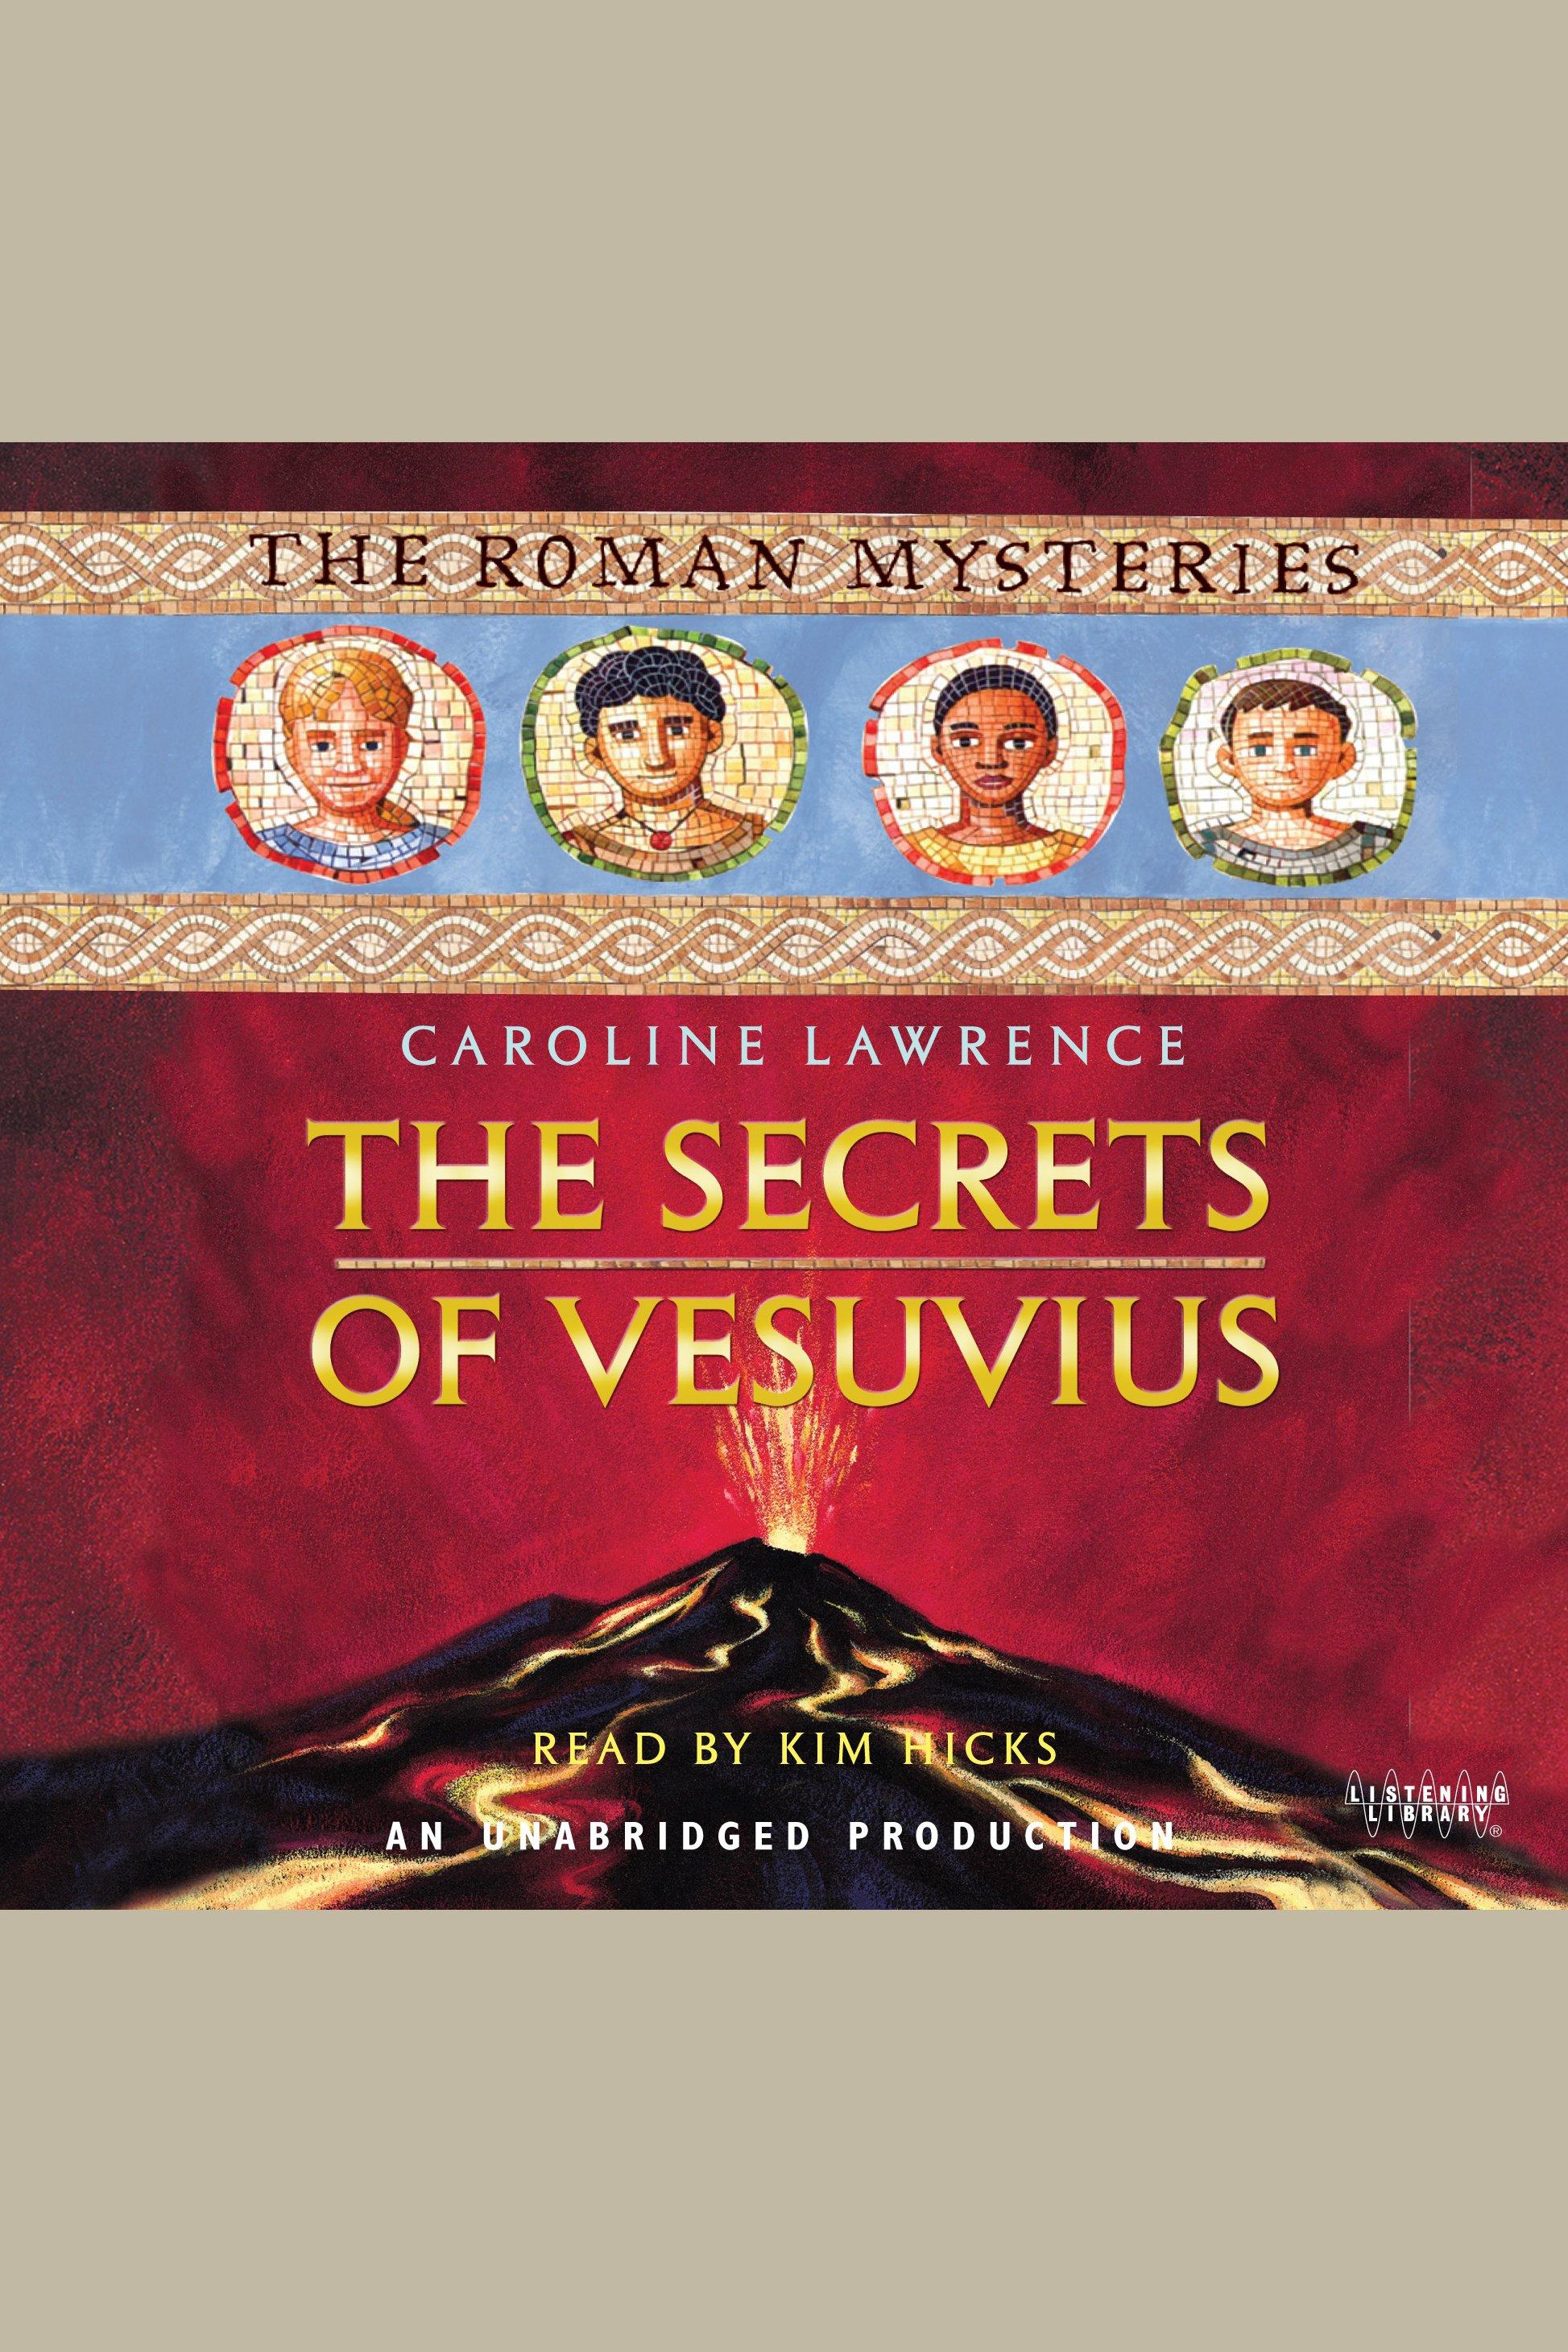 Cover Image of The Roman Mysteries. Book 2: The Secrets of Vesuvius